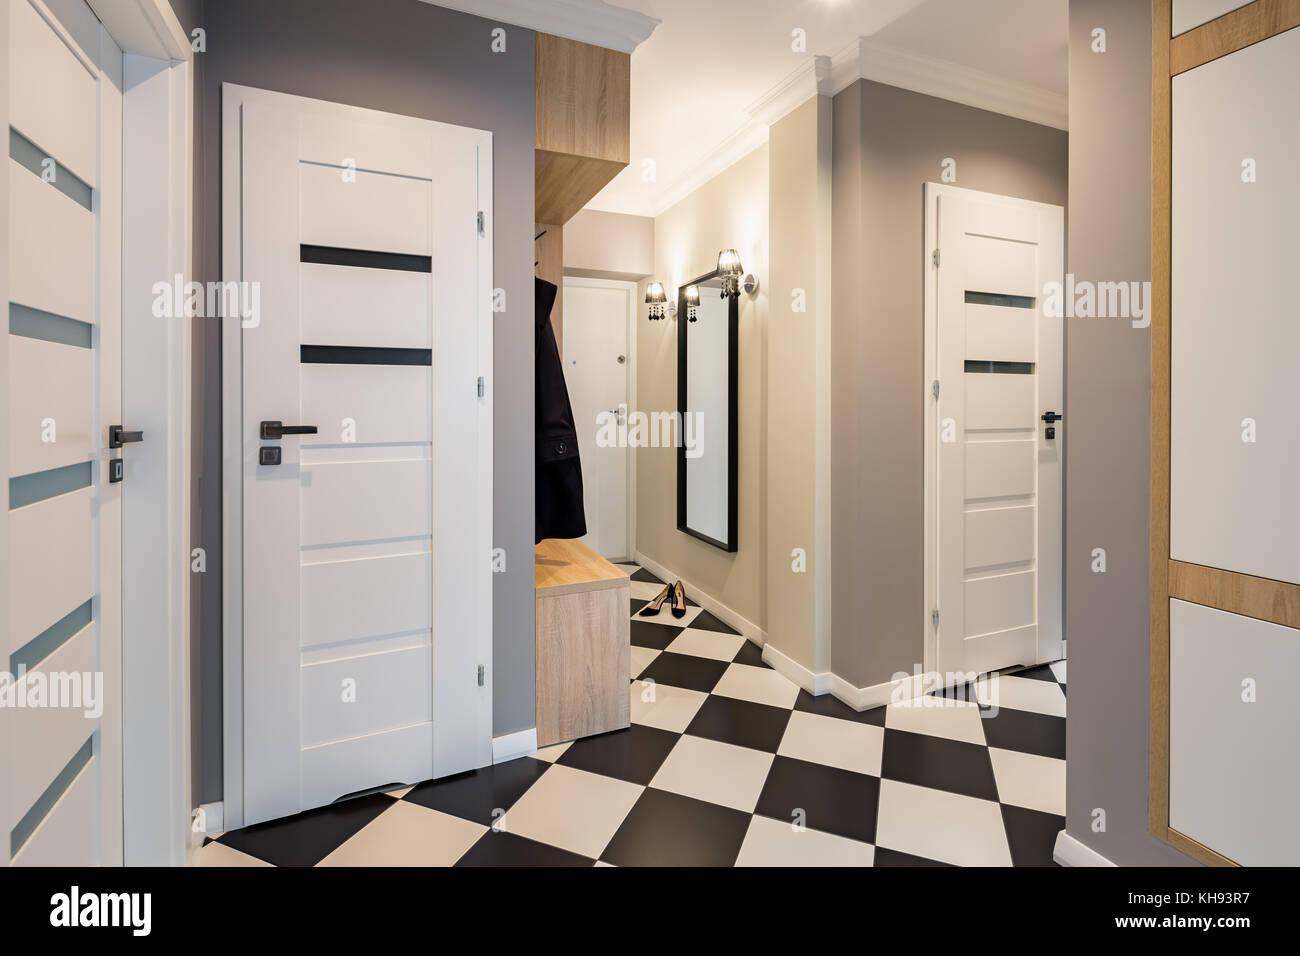 Design interni casa moderna for Design casa moderna interni